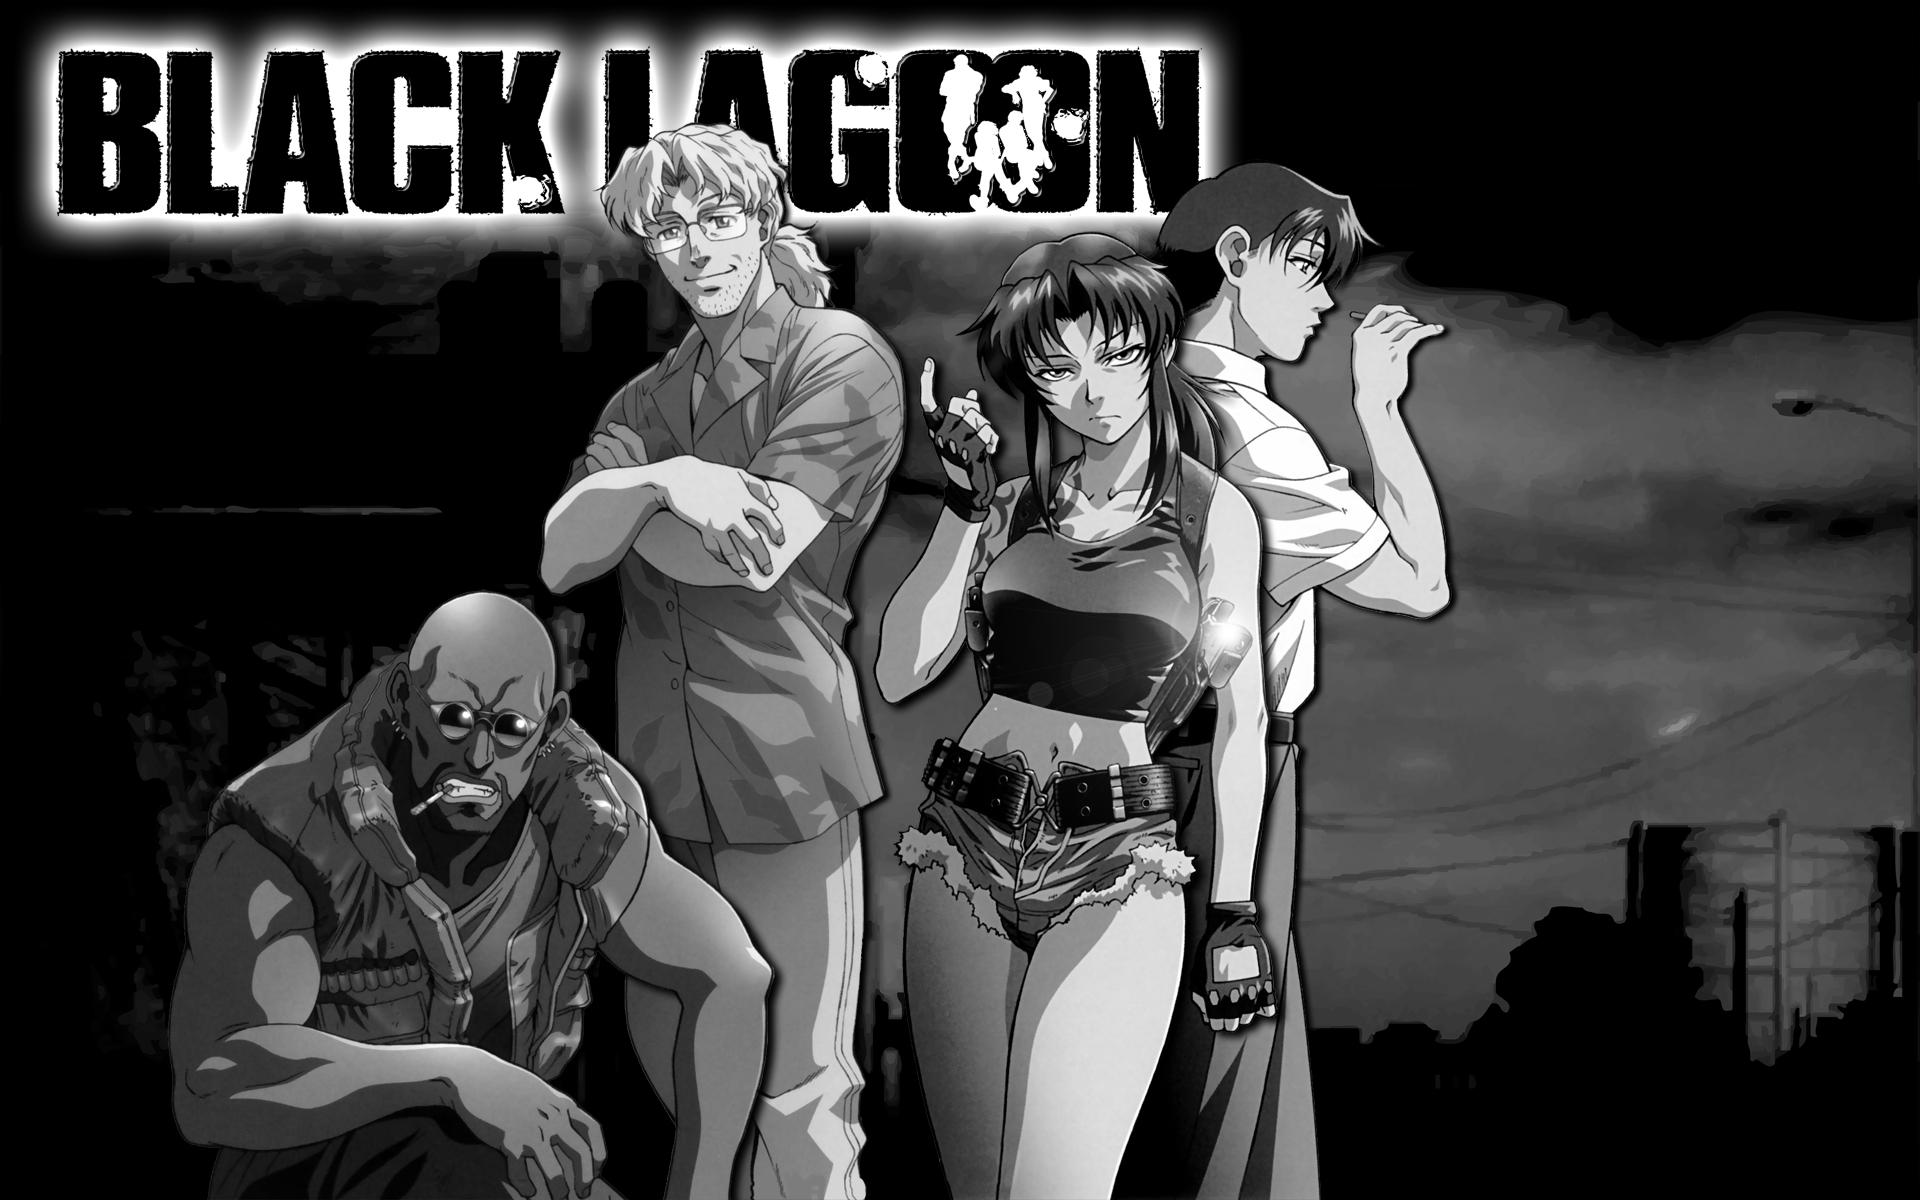 581454 - Un género, un anime - Hablemos de Anime y Manga